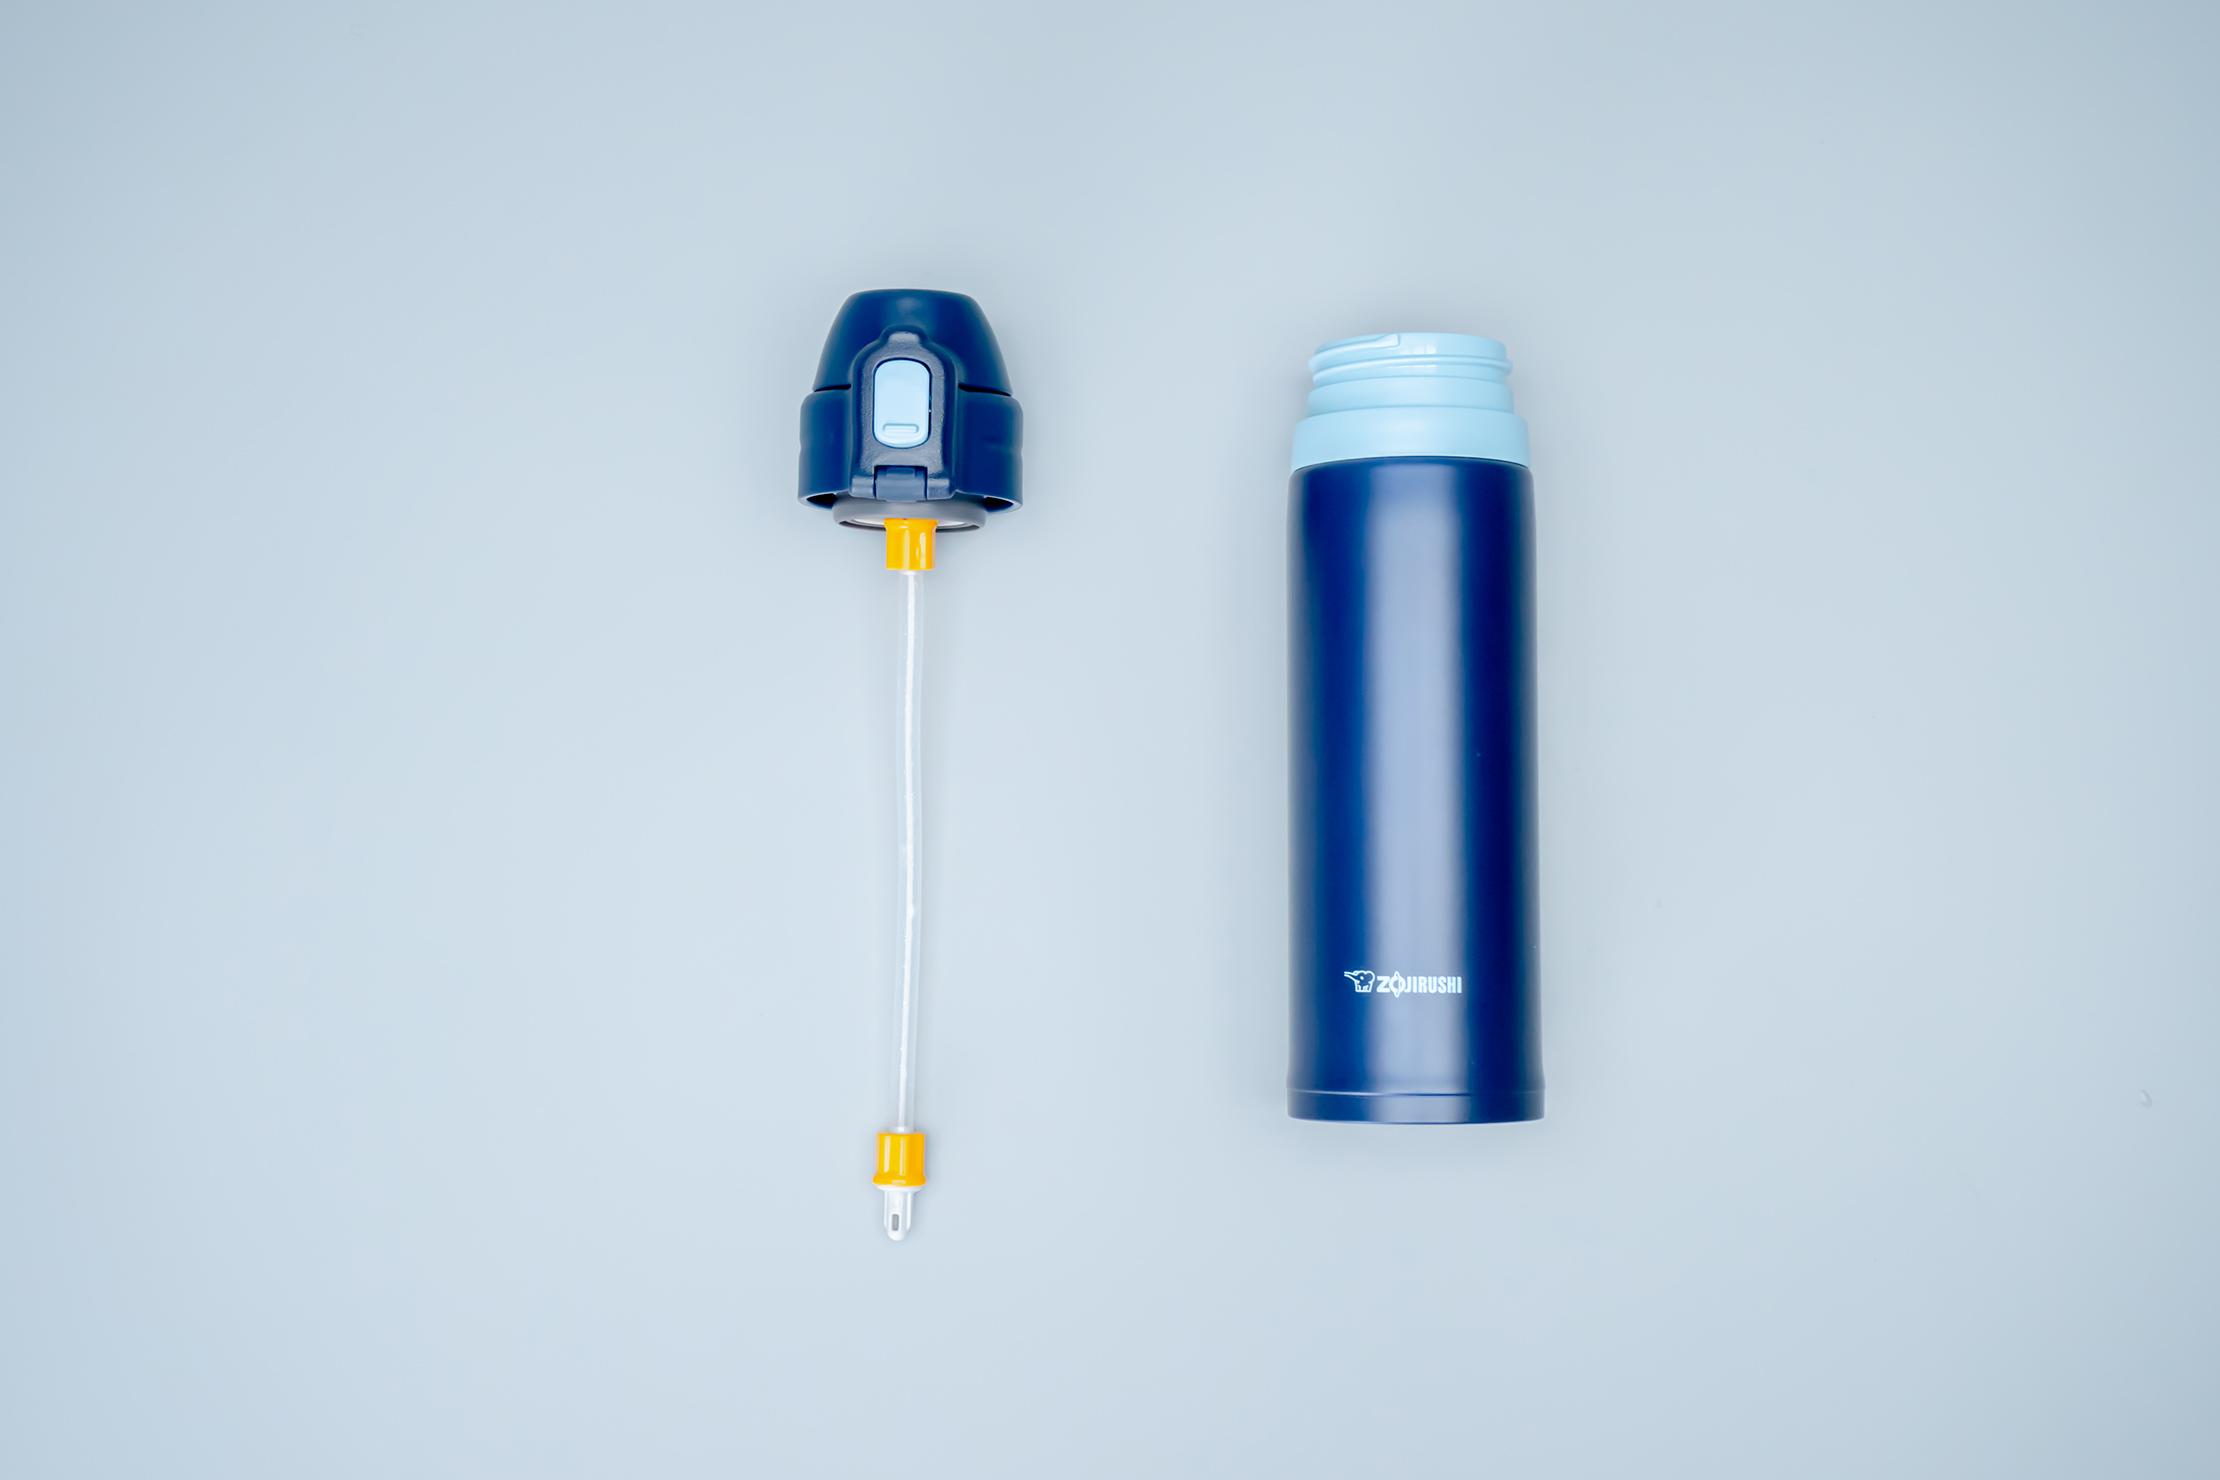 Zojirushi Cool Bottle Straw